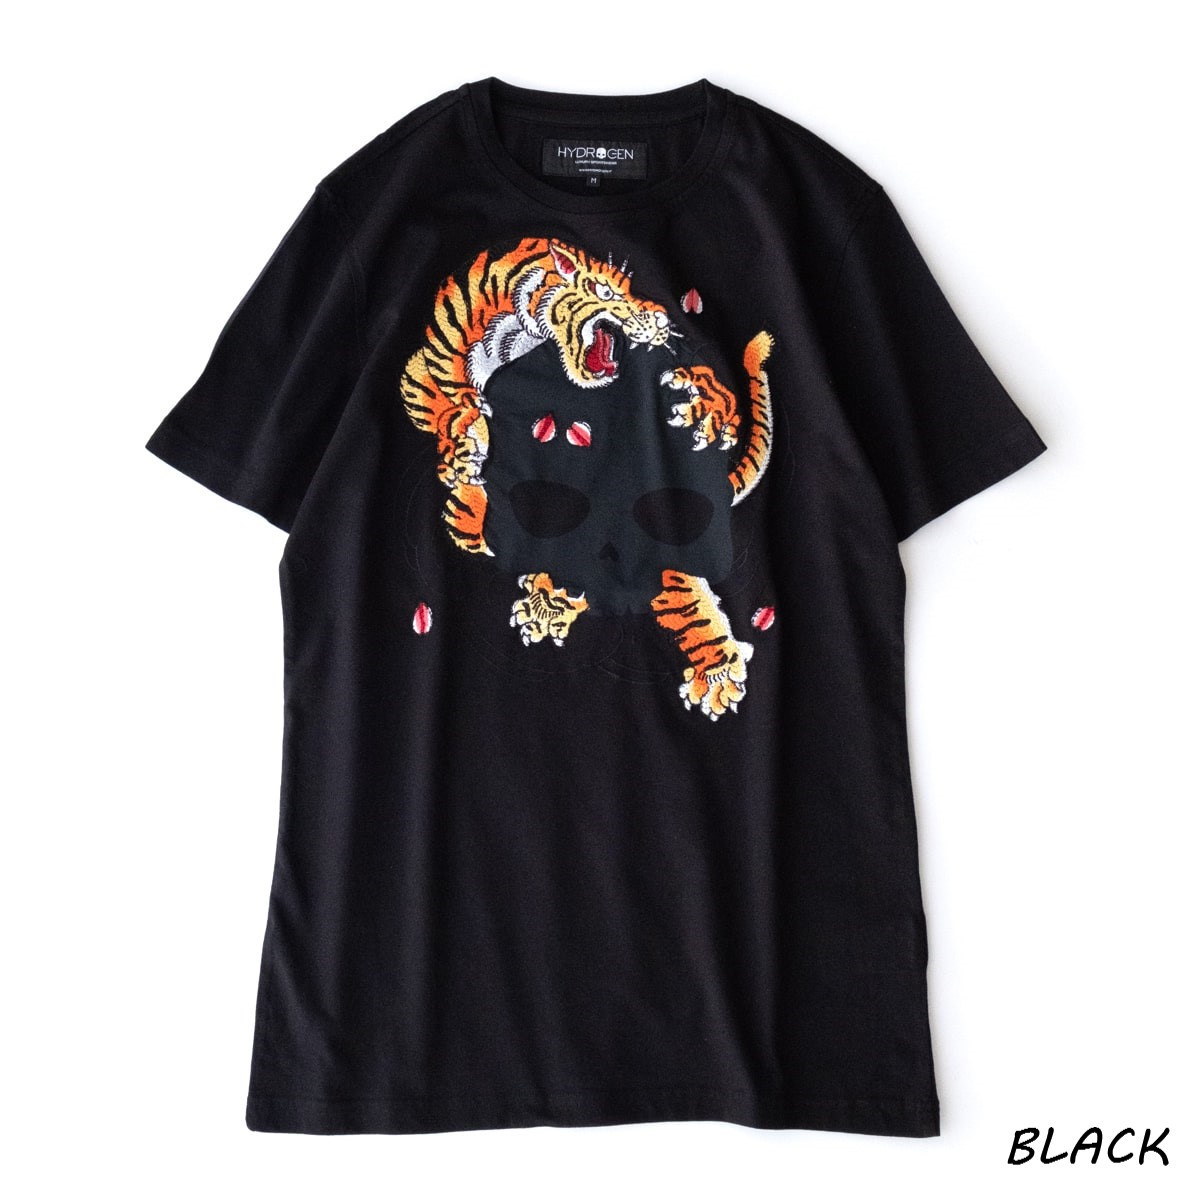 HYDROGEN TIGER HORIOKAMI TEE (2色 WHITE/BLACK) 210-22341004 ハイドロゲン タイガー ホリオオカミ Tシャツ 虎 彫狼 スカル 刺繍 立体感 躍動感 カットソー イタリア メンズ 送料無料